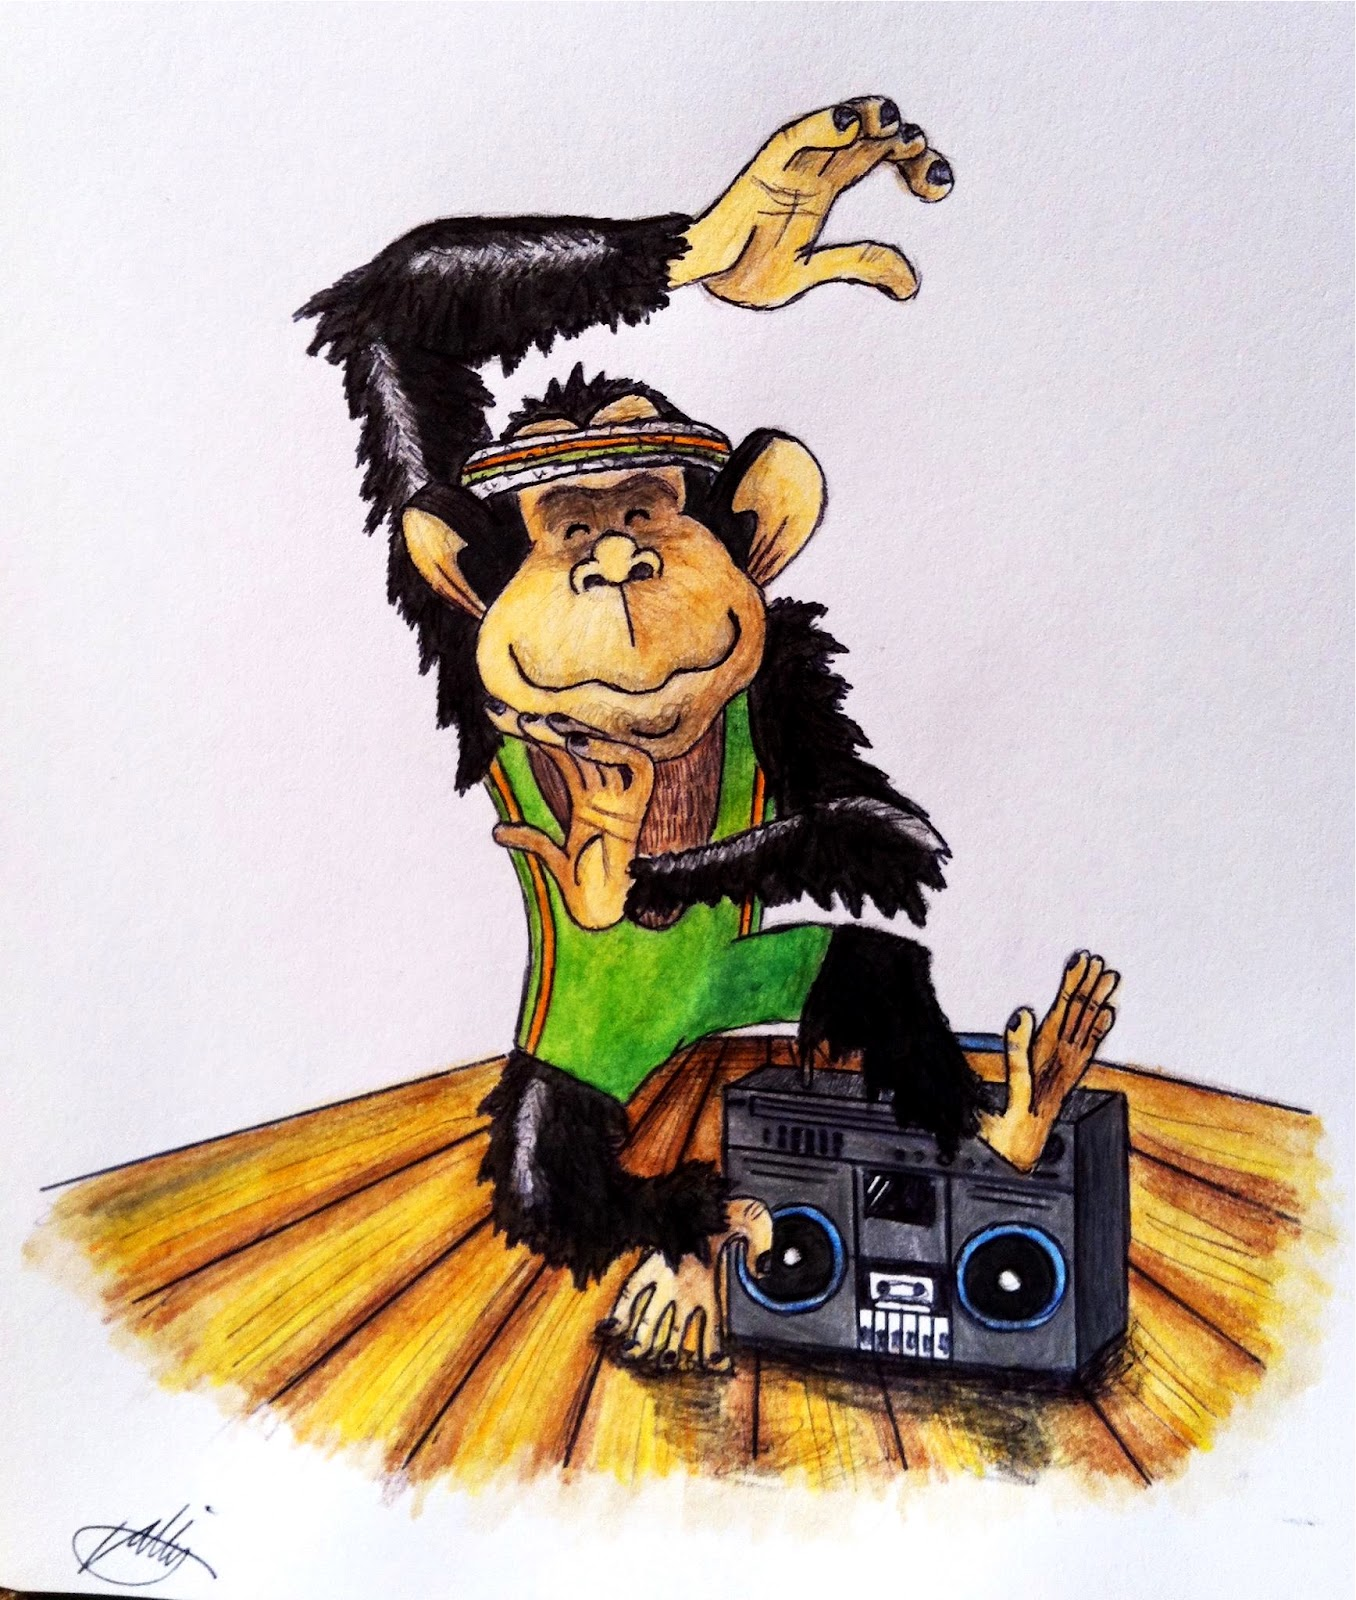 http://3.bp.blogspot.com/-YZ_JVVtTyoE/T42T1Pgq8PI/AAAAAAAAAHE/P5zddb_kxMc/s1600/Monkey+3.jpg